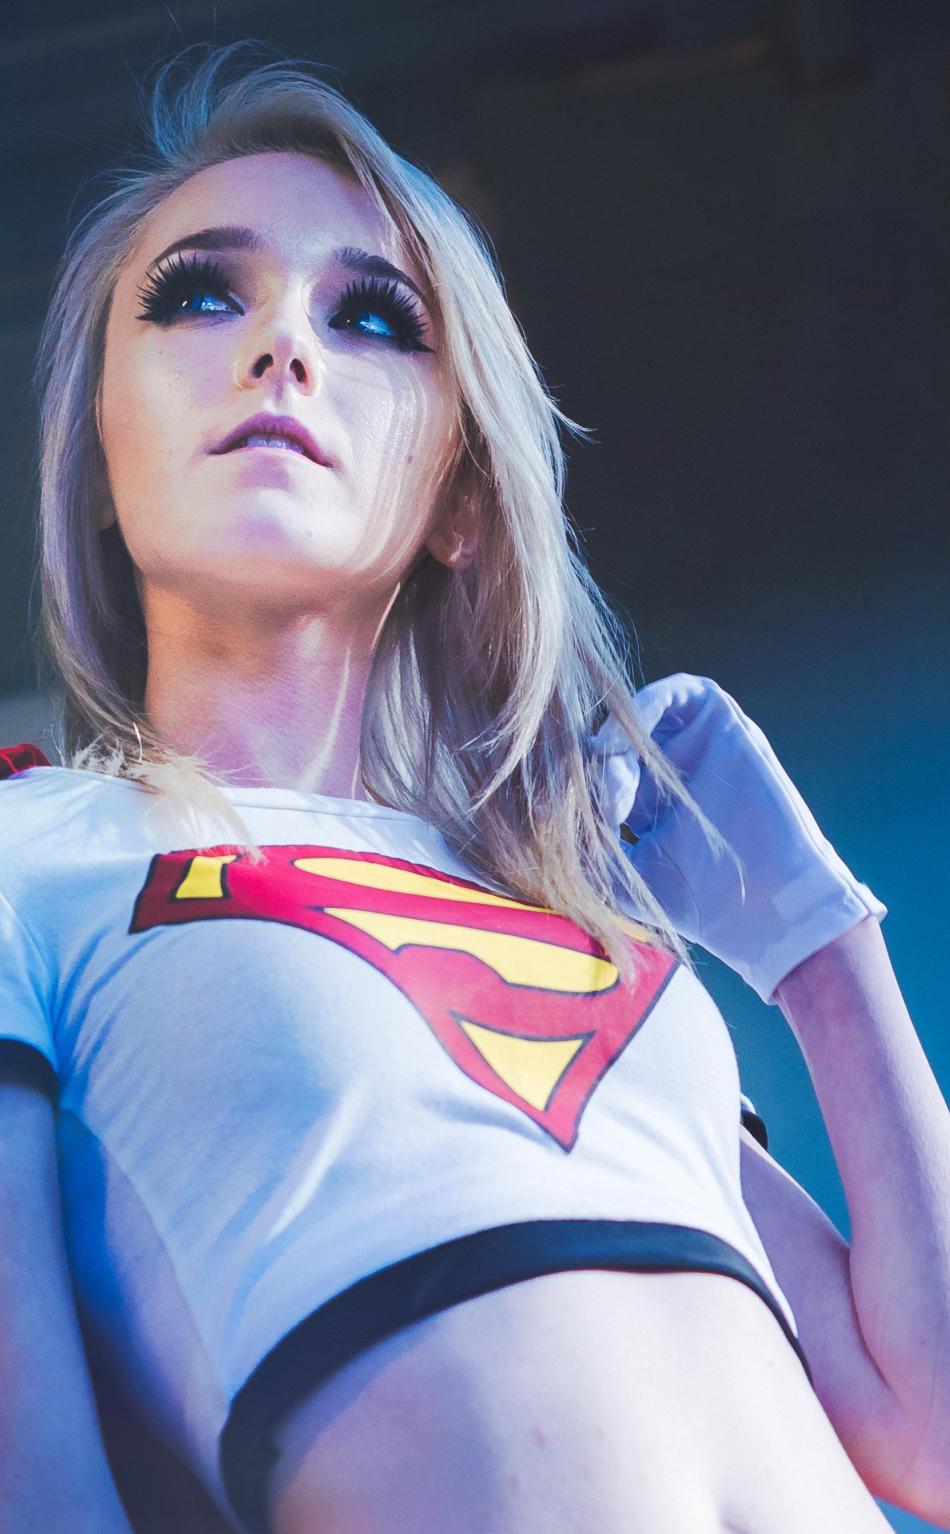 Kawaii queen tsun as supergirl cosplay hd 4k wallpaper - 4k girl wallpaper for iphone ...